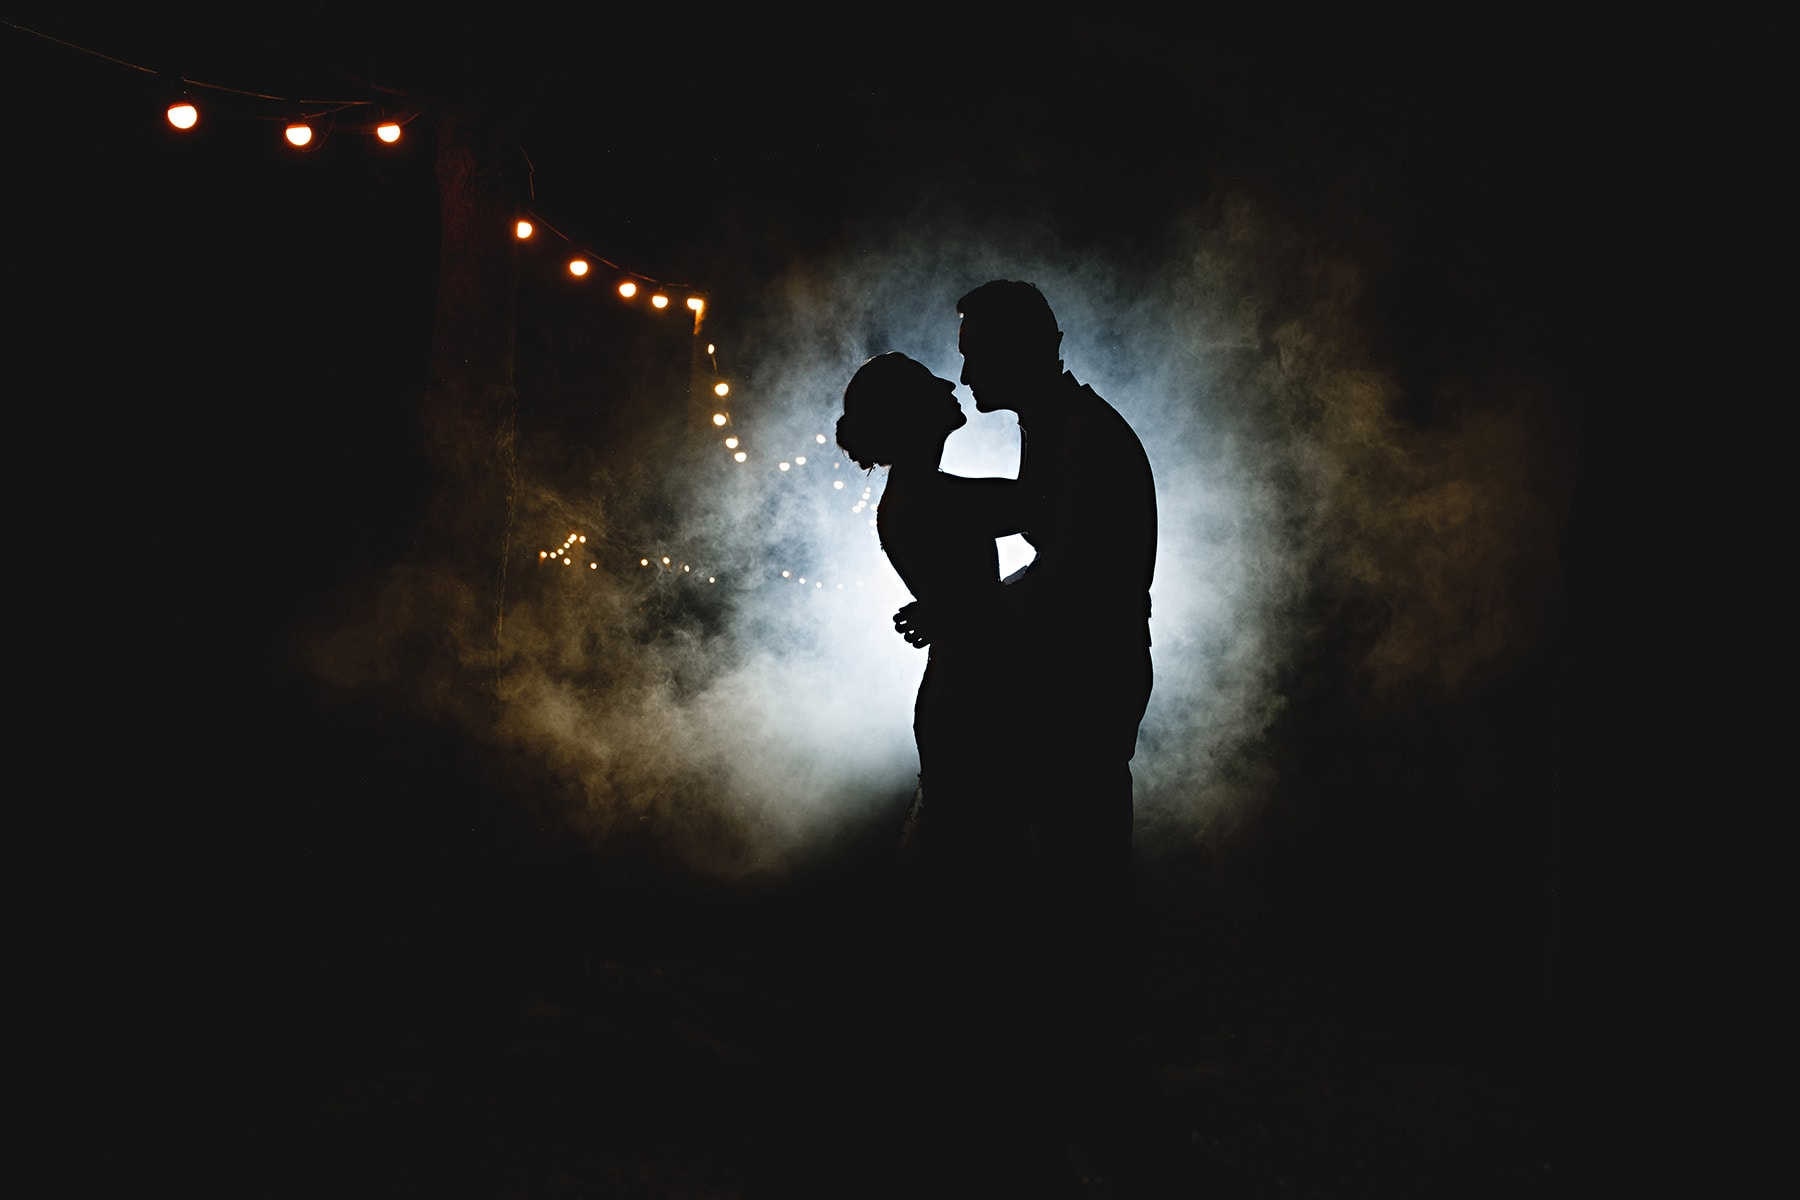 The bride and groom in smoke at Shustoke Barns in Warwickshire